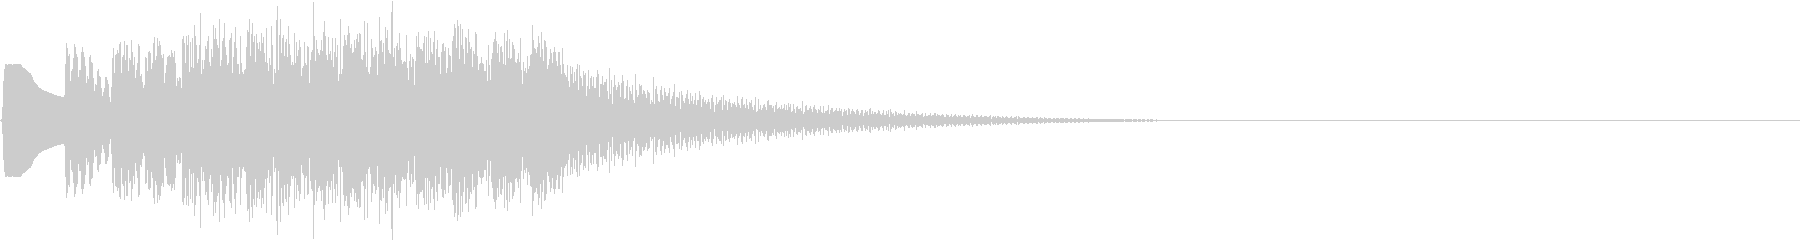 TVFX 成功 完成 目標達成 SE 4の未再生の波形